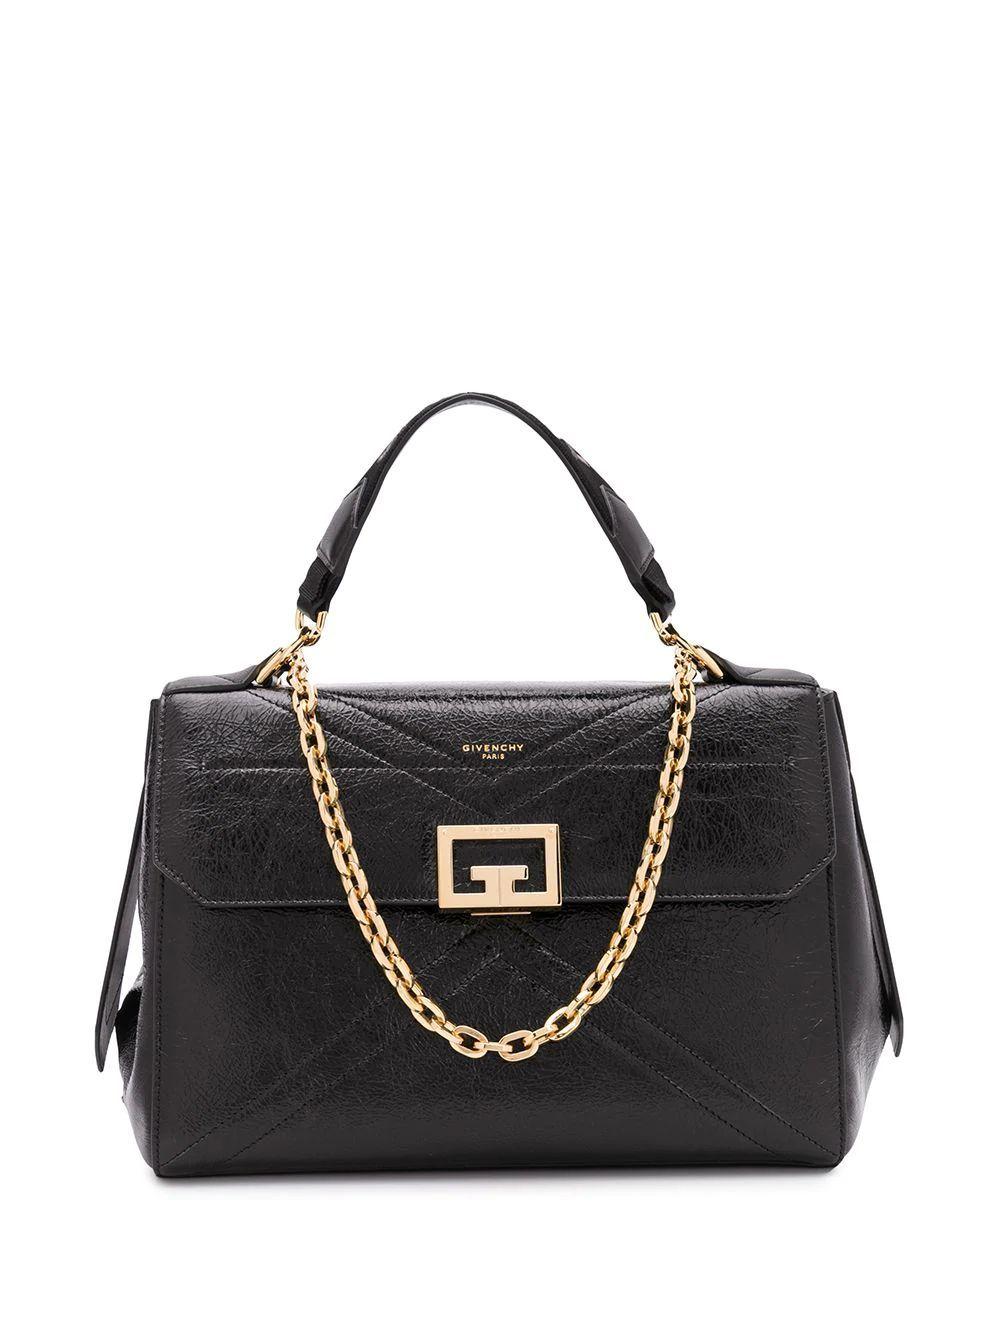 GIVENCHY WOMEN'S BB50C4B0S5001 BLACK LEATHER HANDBAG